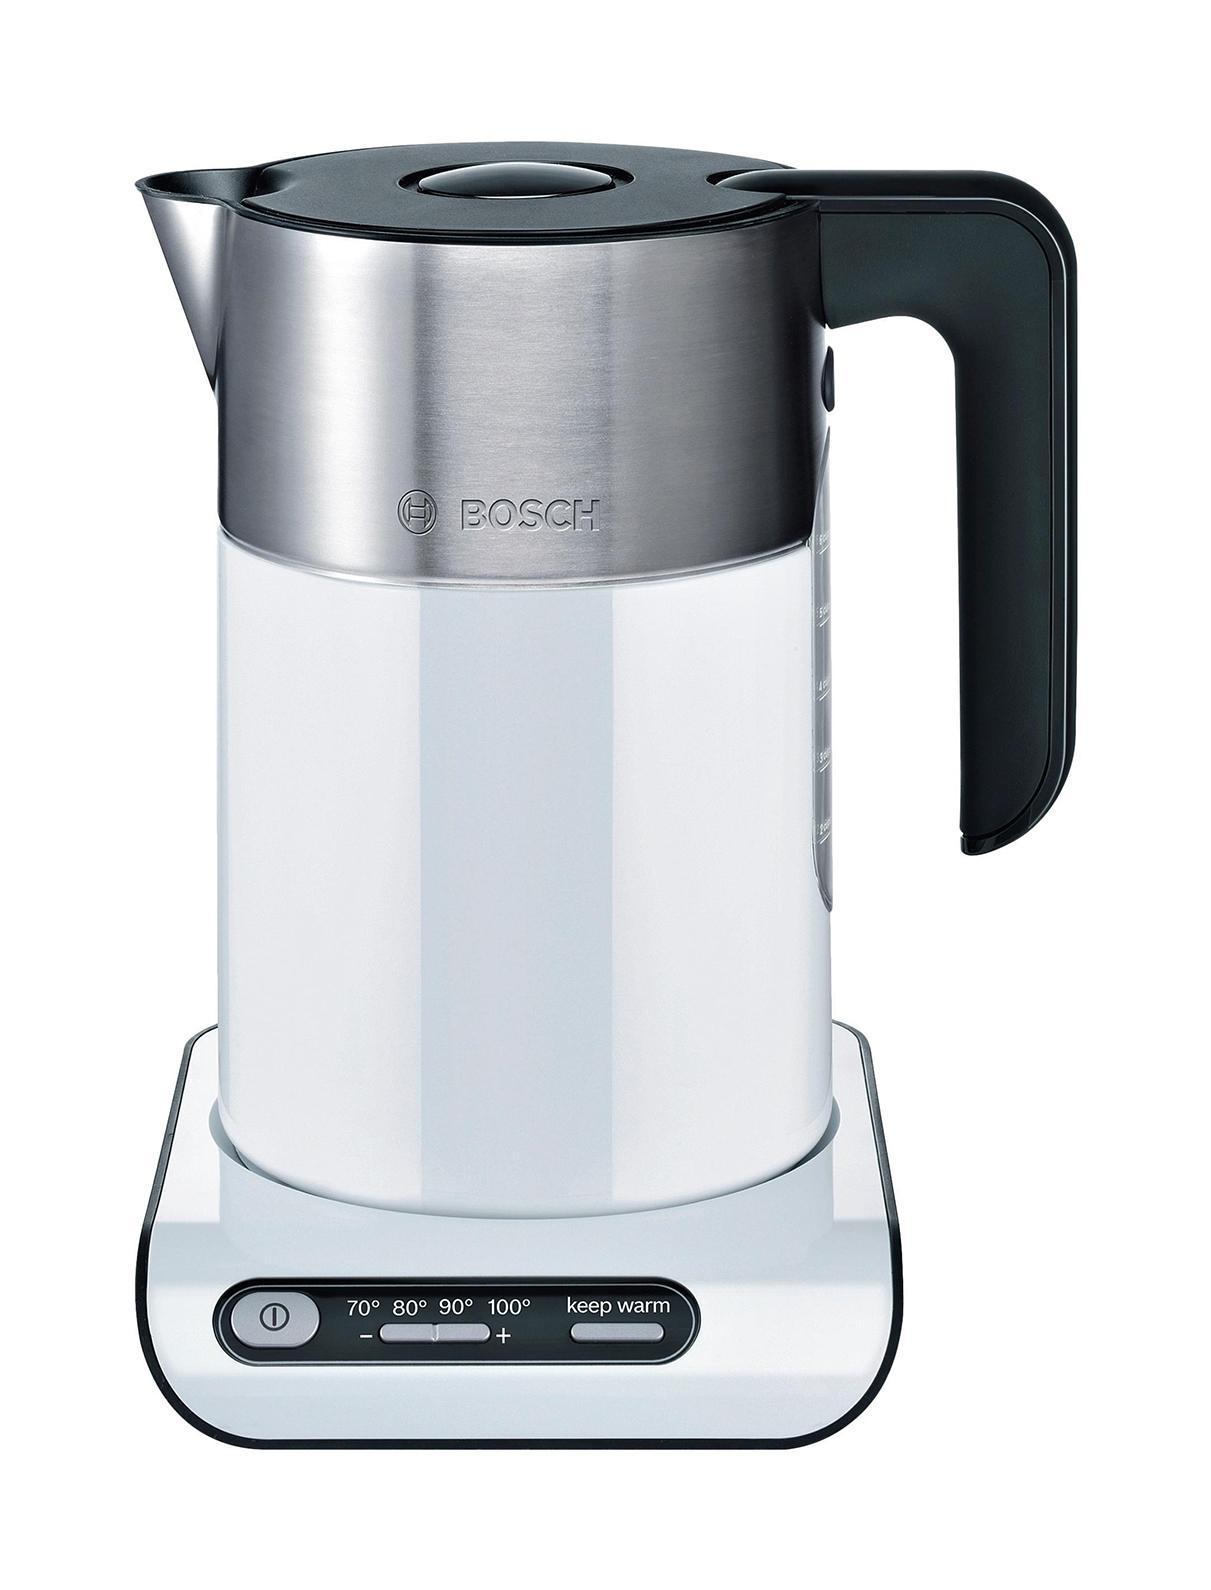 Bosch TWK 8611, электрочайник электрический чайник bosch twk 8611 p twk 8611 p